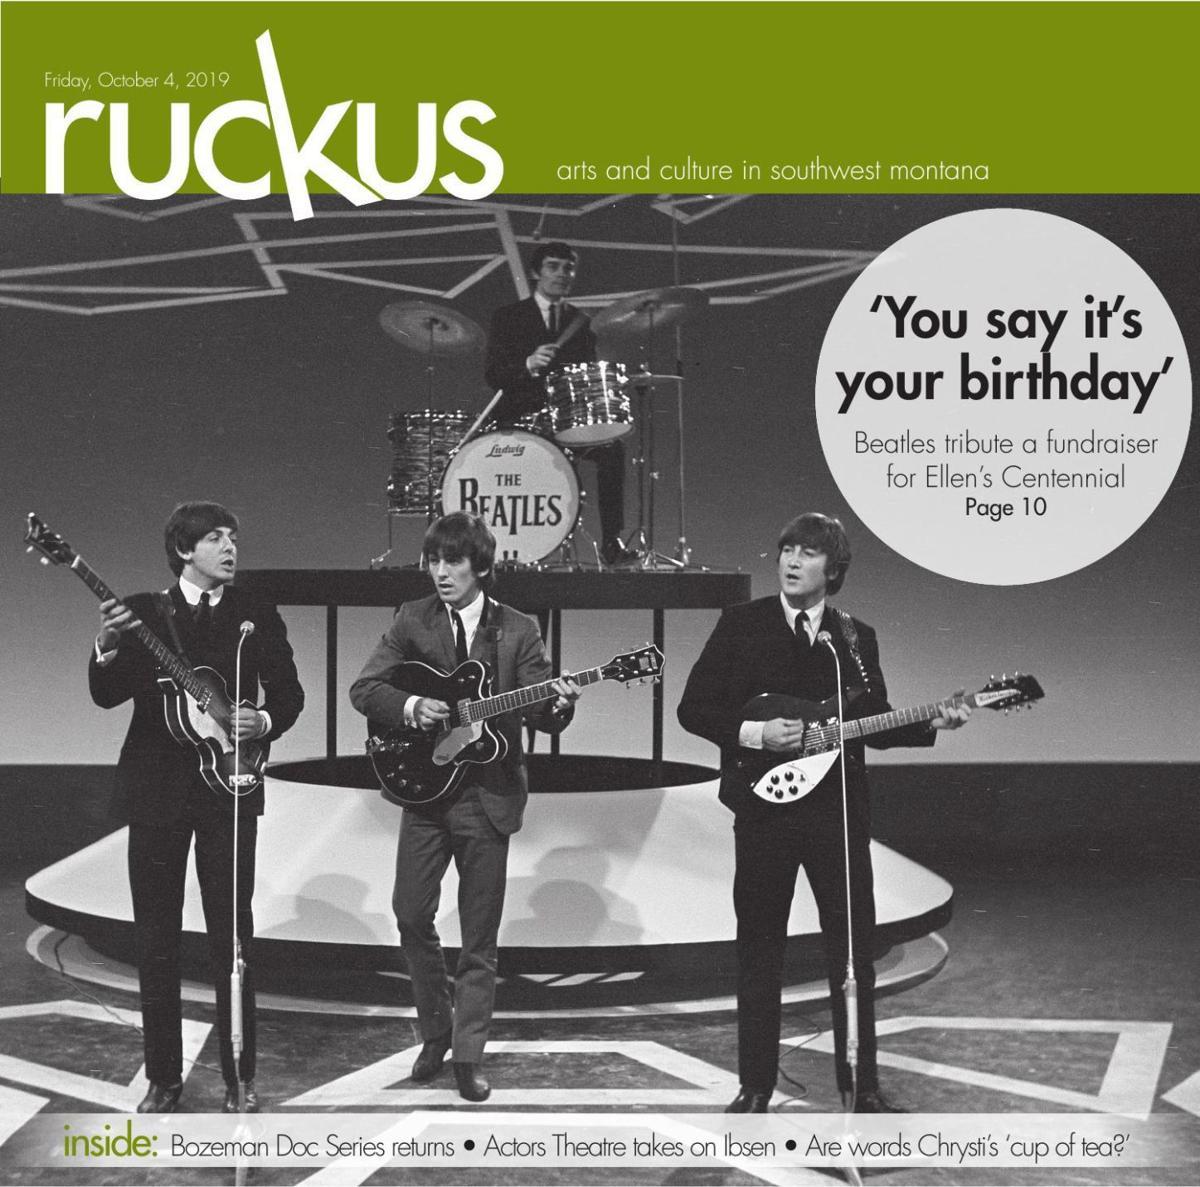 Ruckus print edition October 4, 2019